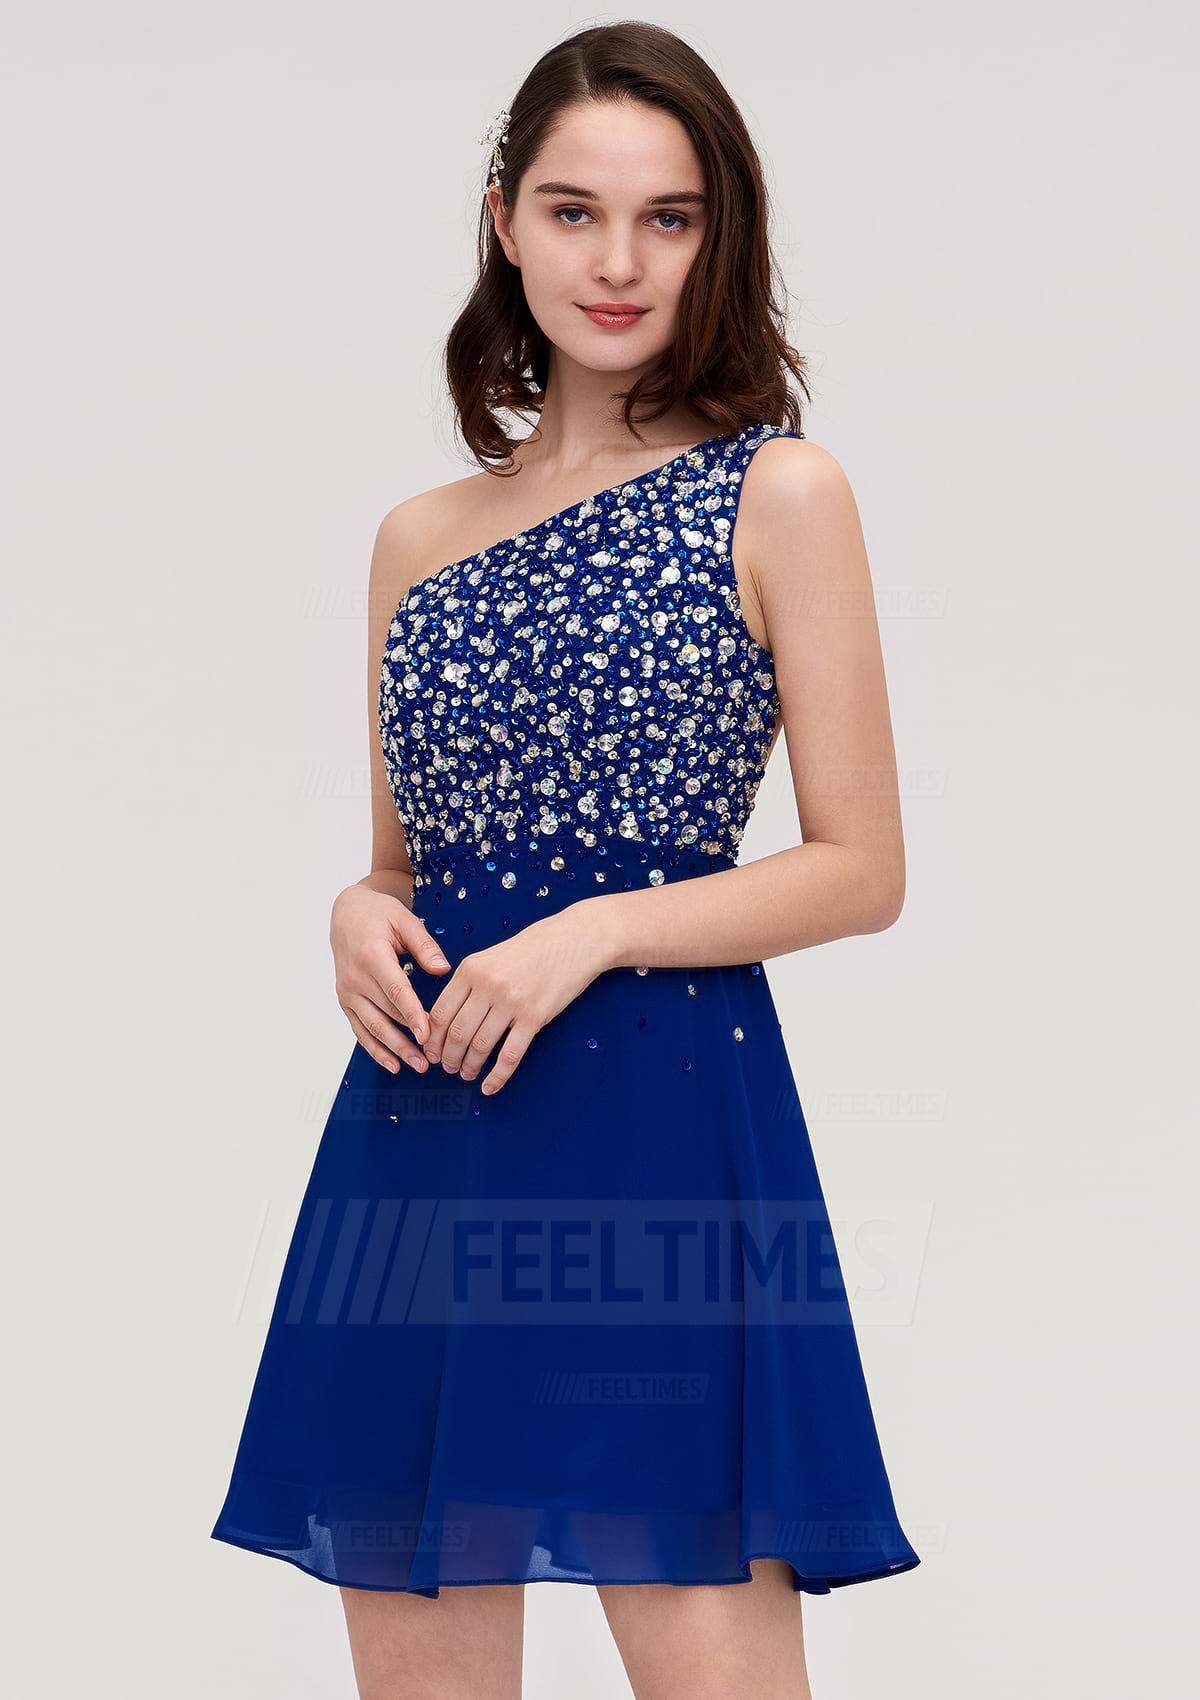 A-Line/Princess One-Shoulder Sleeveless Short/Mini Chiffon Homecoming Dress With Crystal